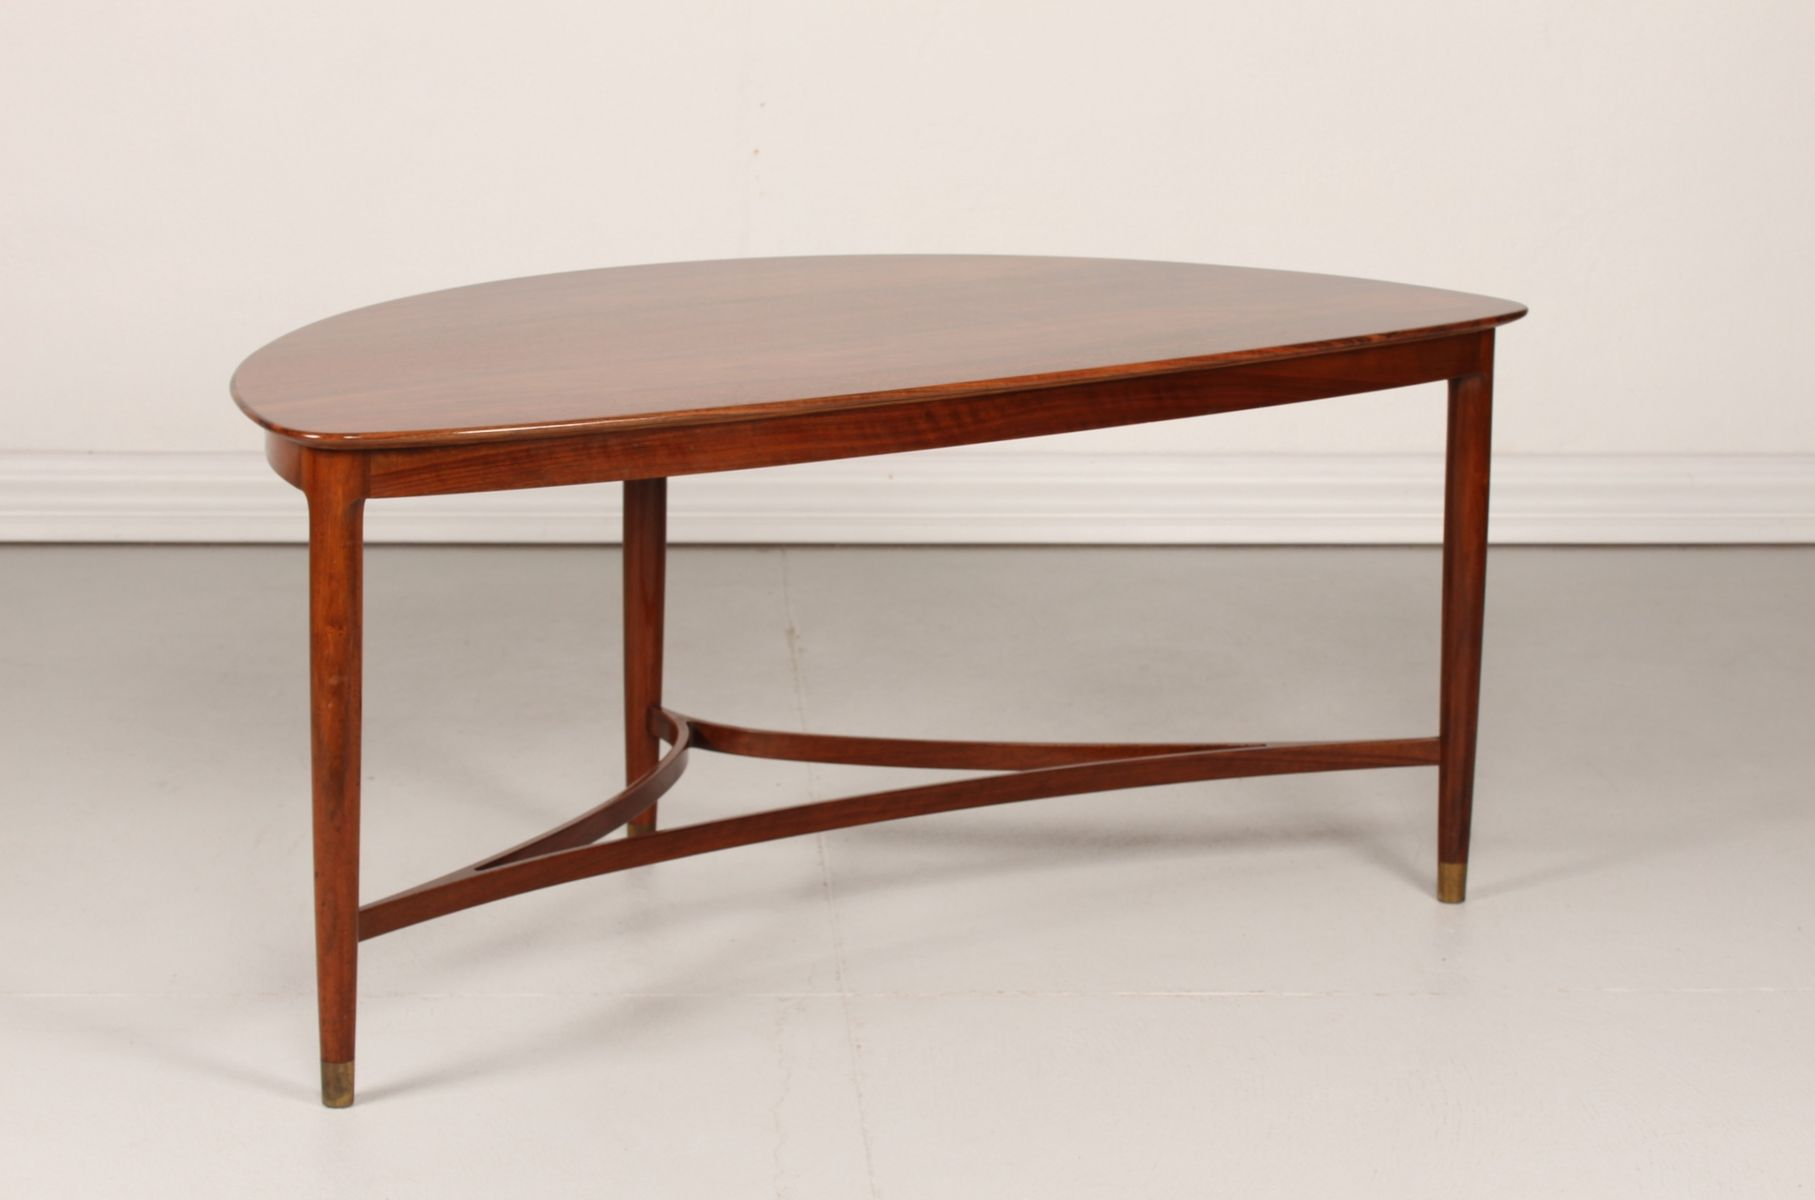 Danish Triangular Coffee Table, 1950s